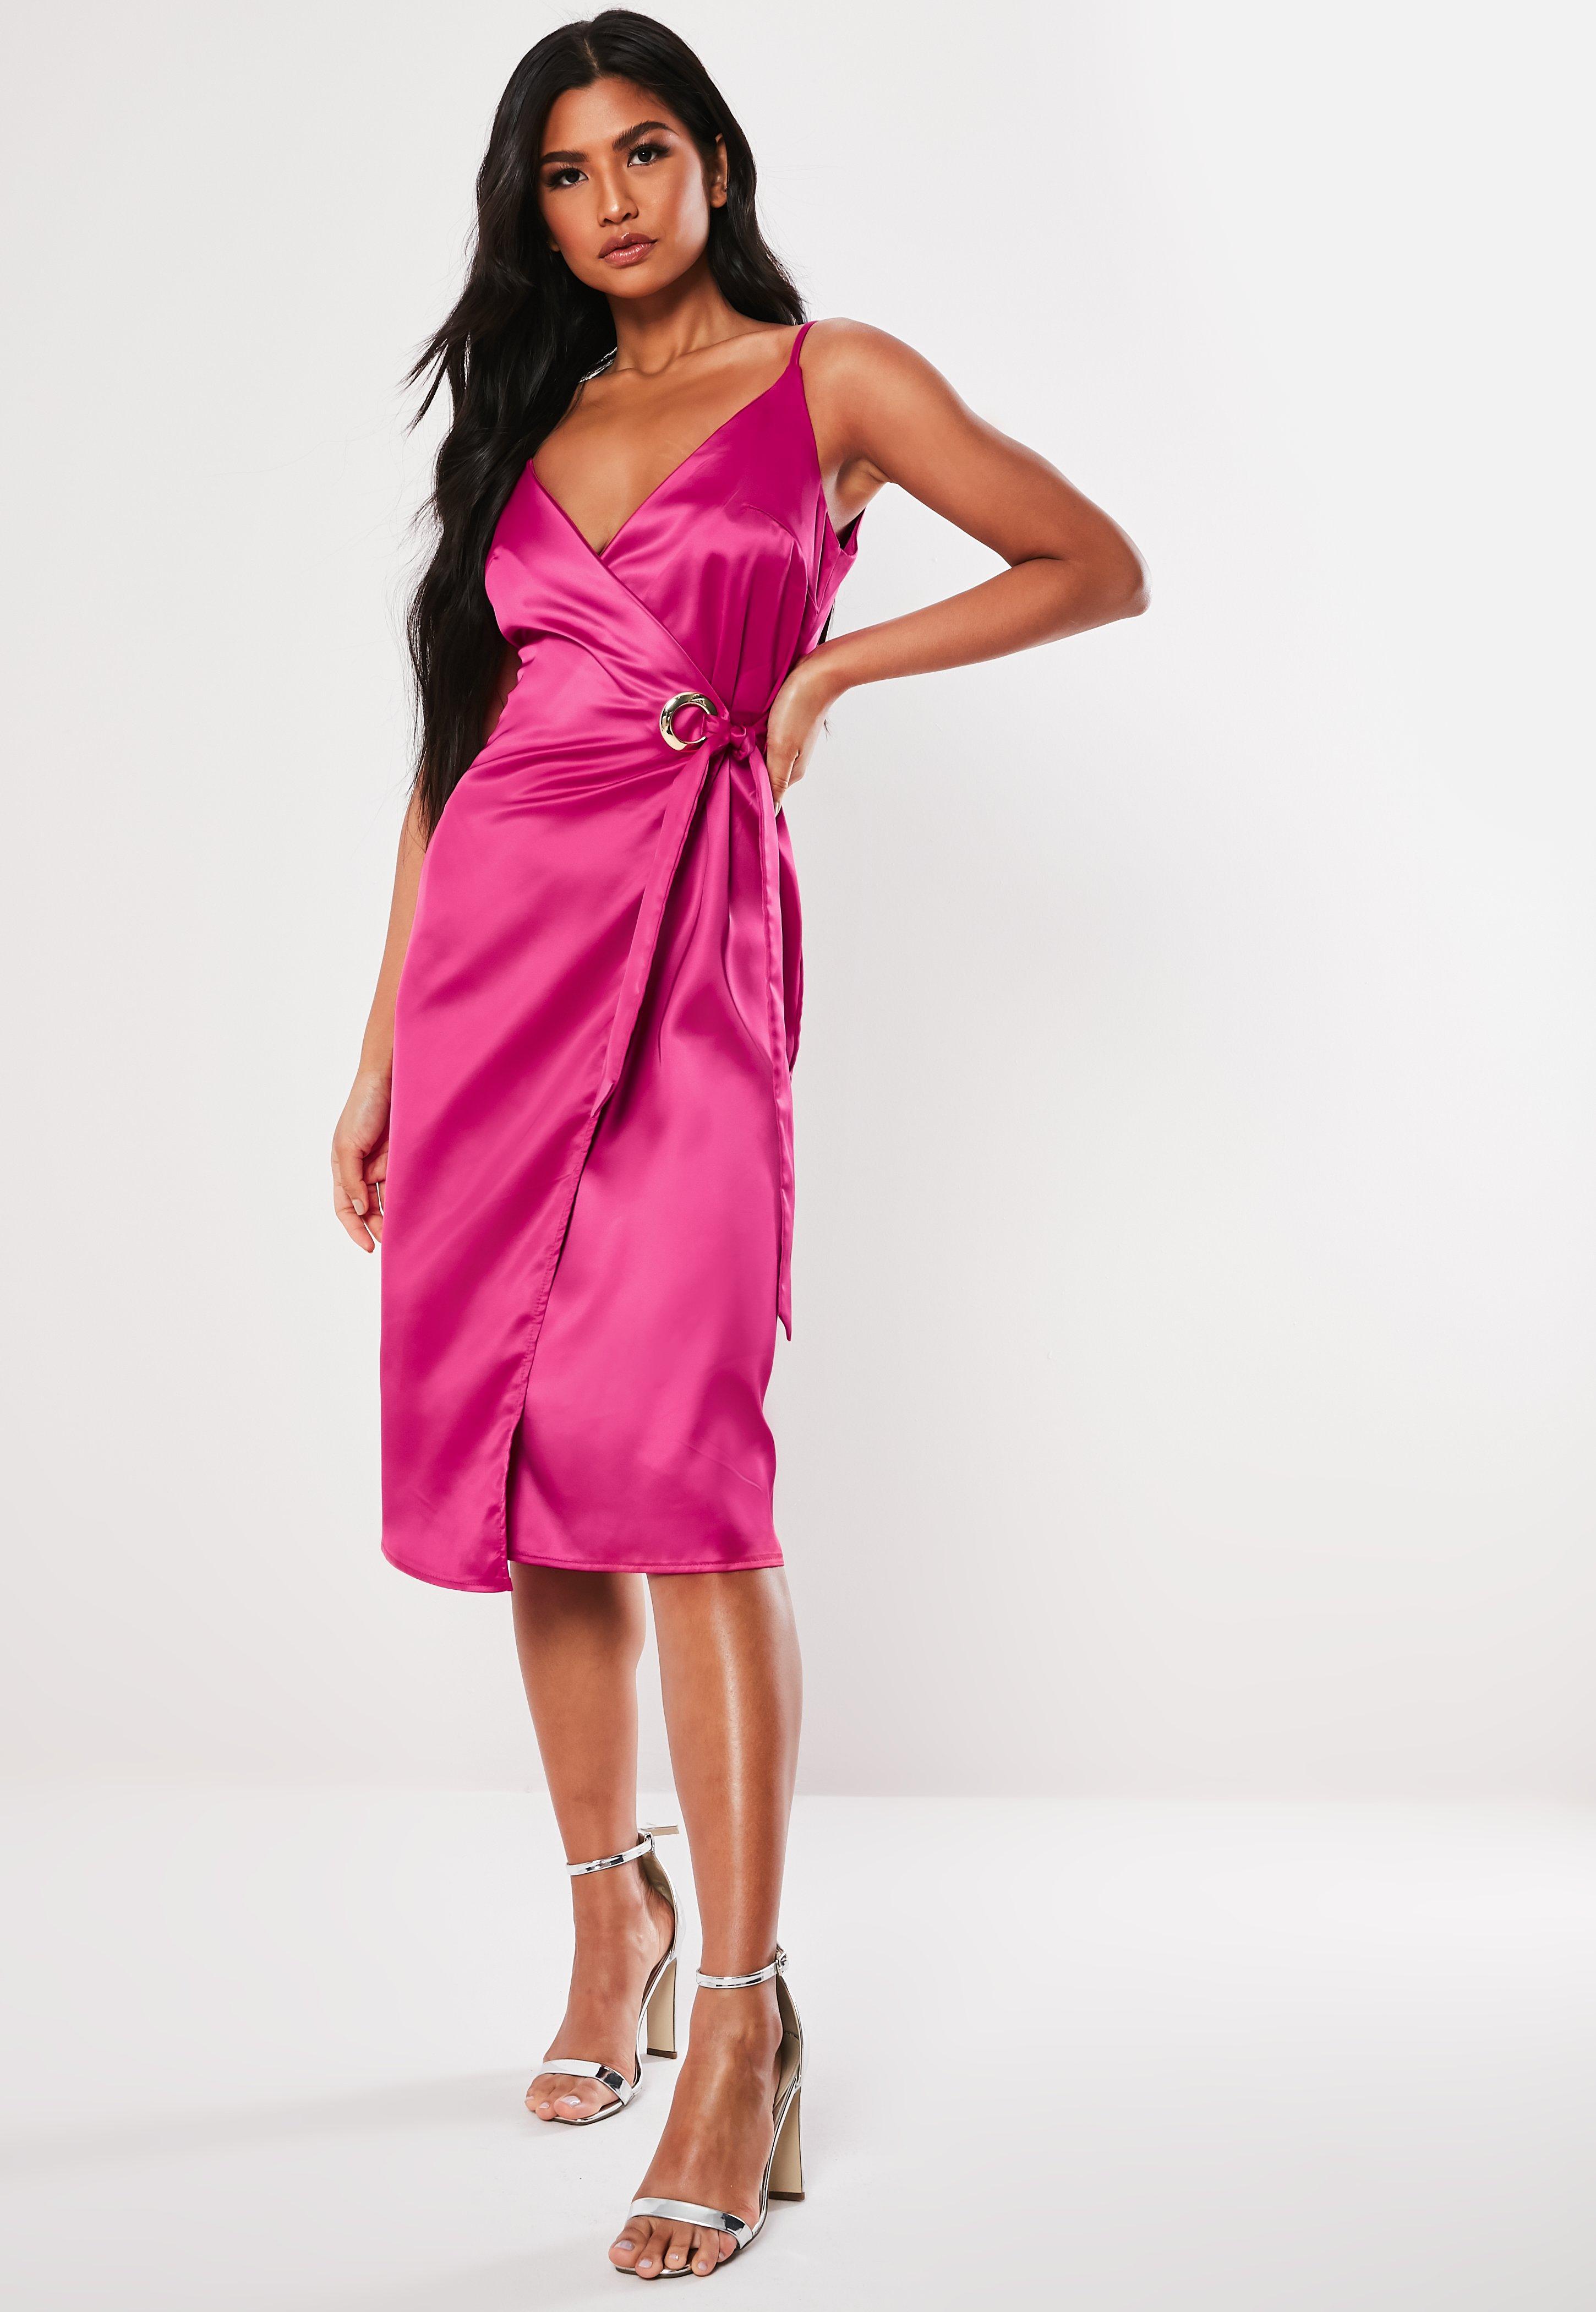 Neon Cerise Prom Dress